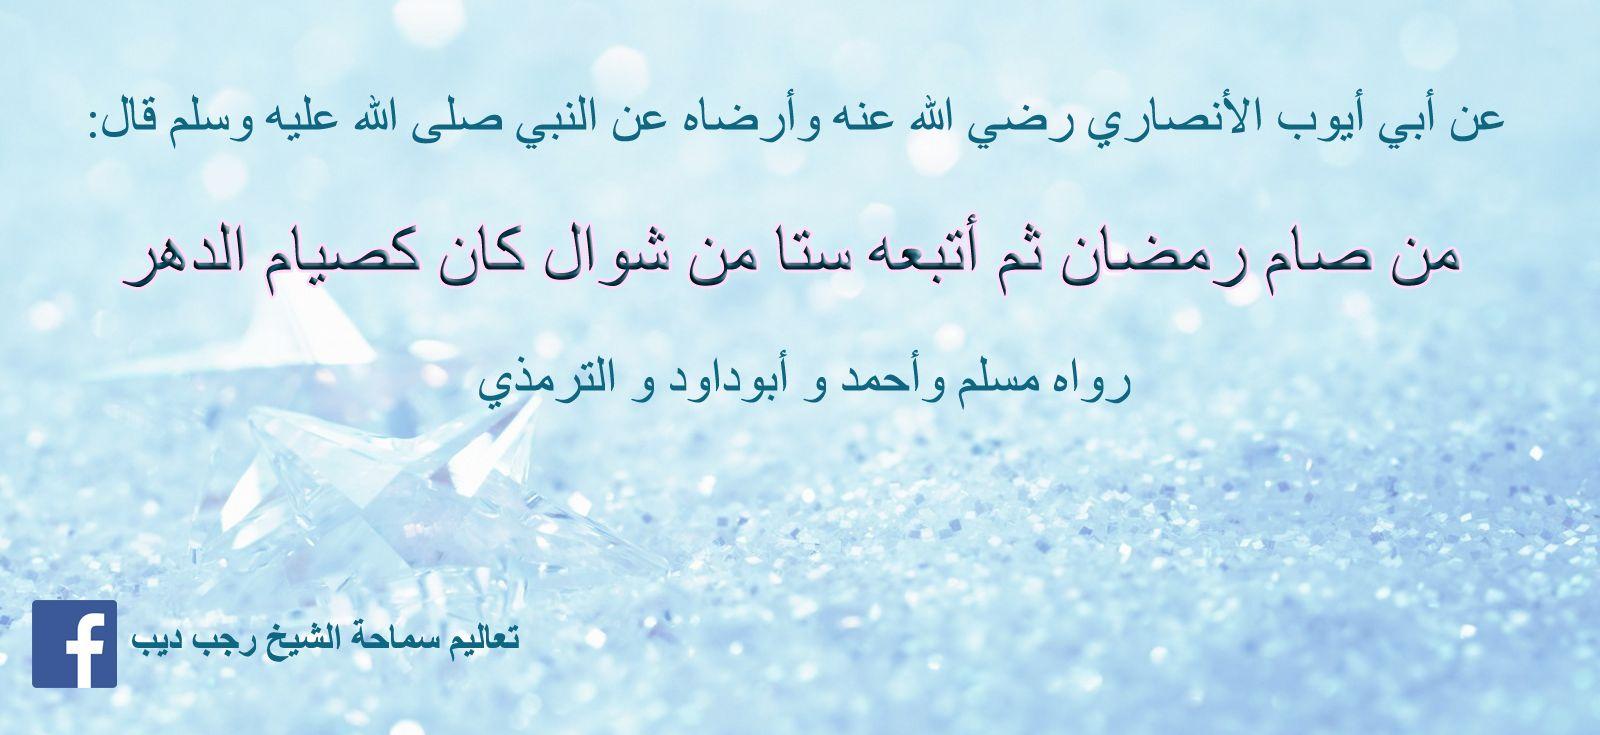 Pin By من تعاليم سماحة الشيخ رجب ديب On أحاديث نبوية شريفة Alloa Math Calligraphy